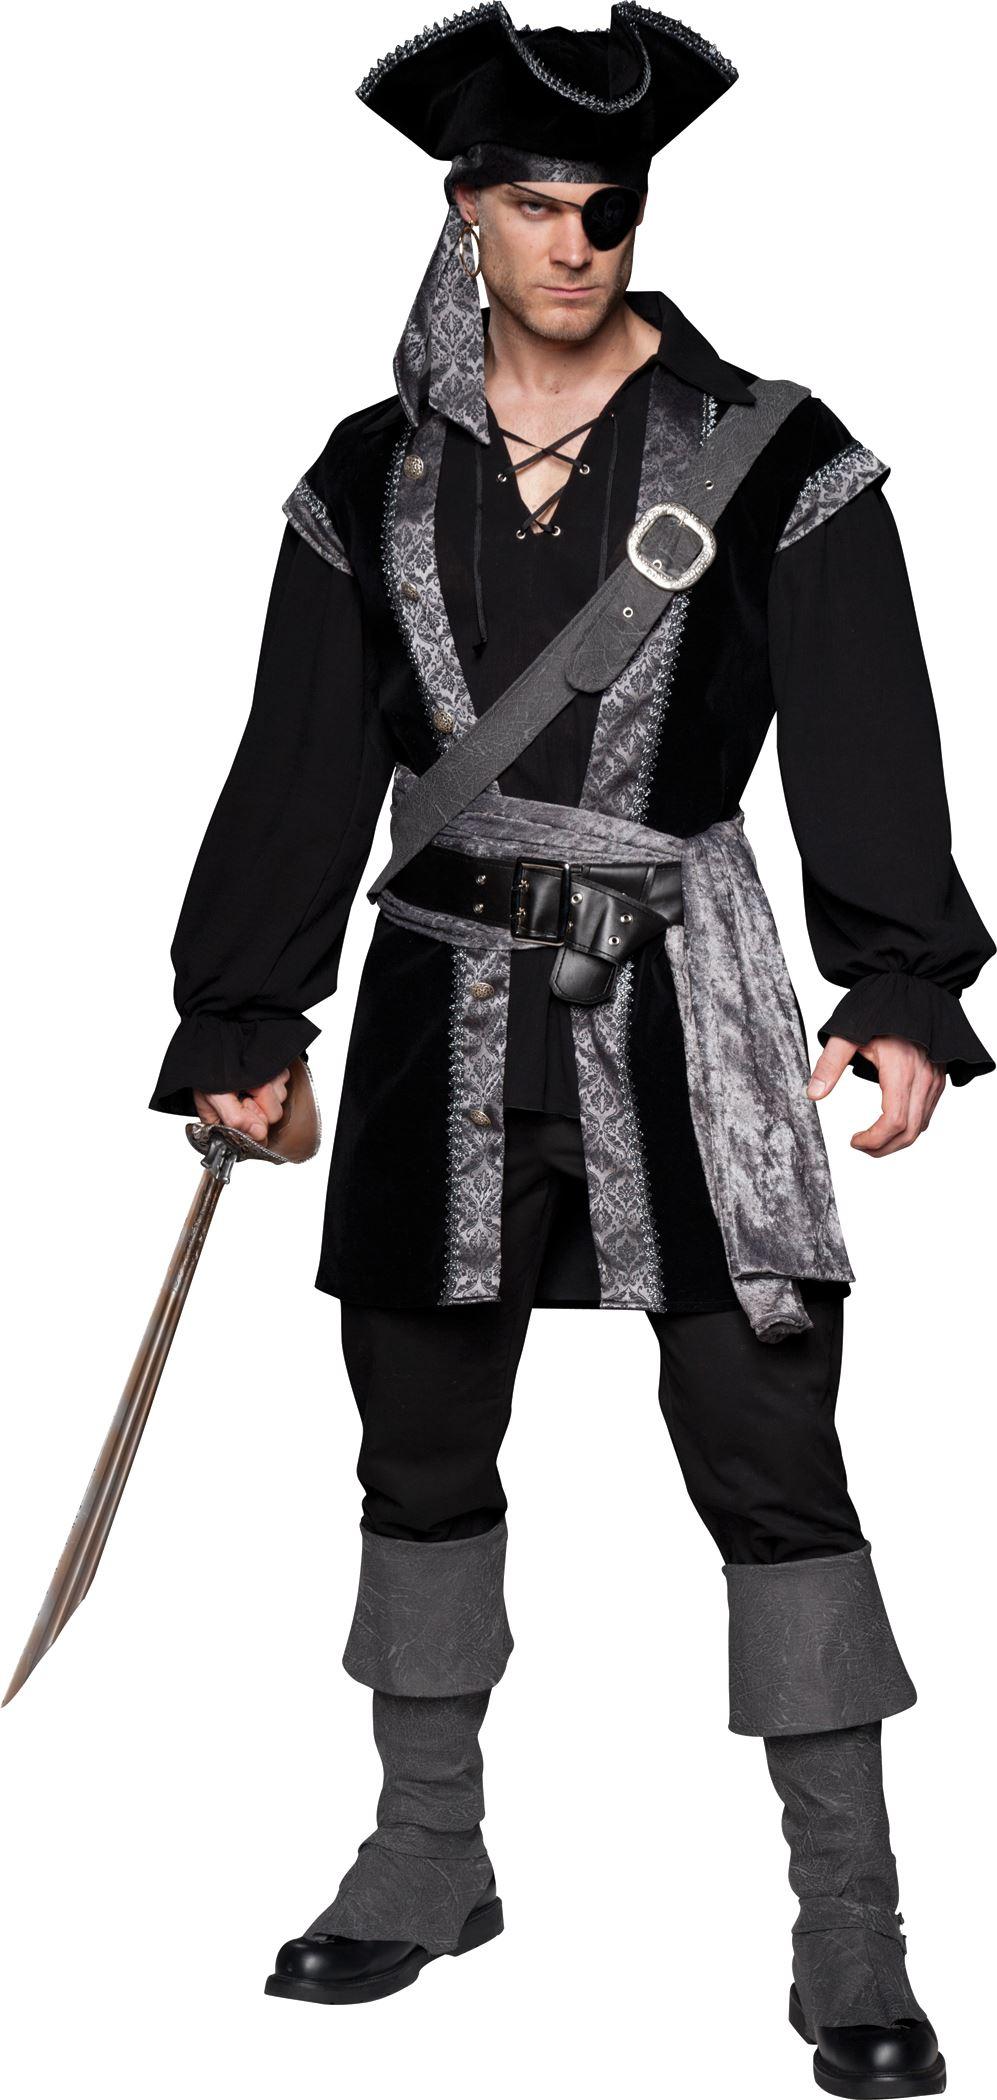 high seas rogue men pirate deluxe halloween costume - Deluxe Halloween Costume